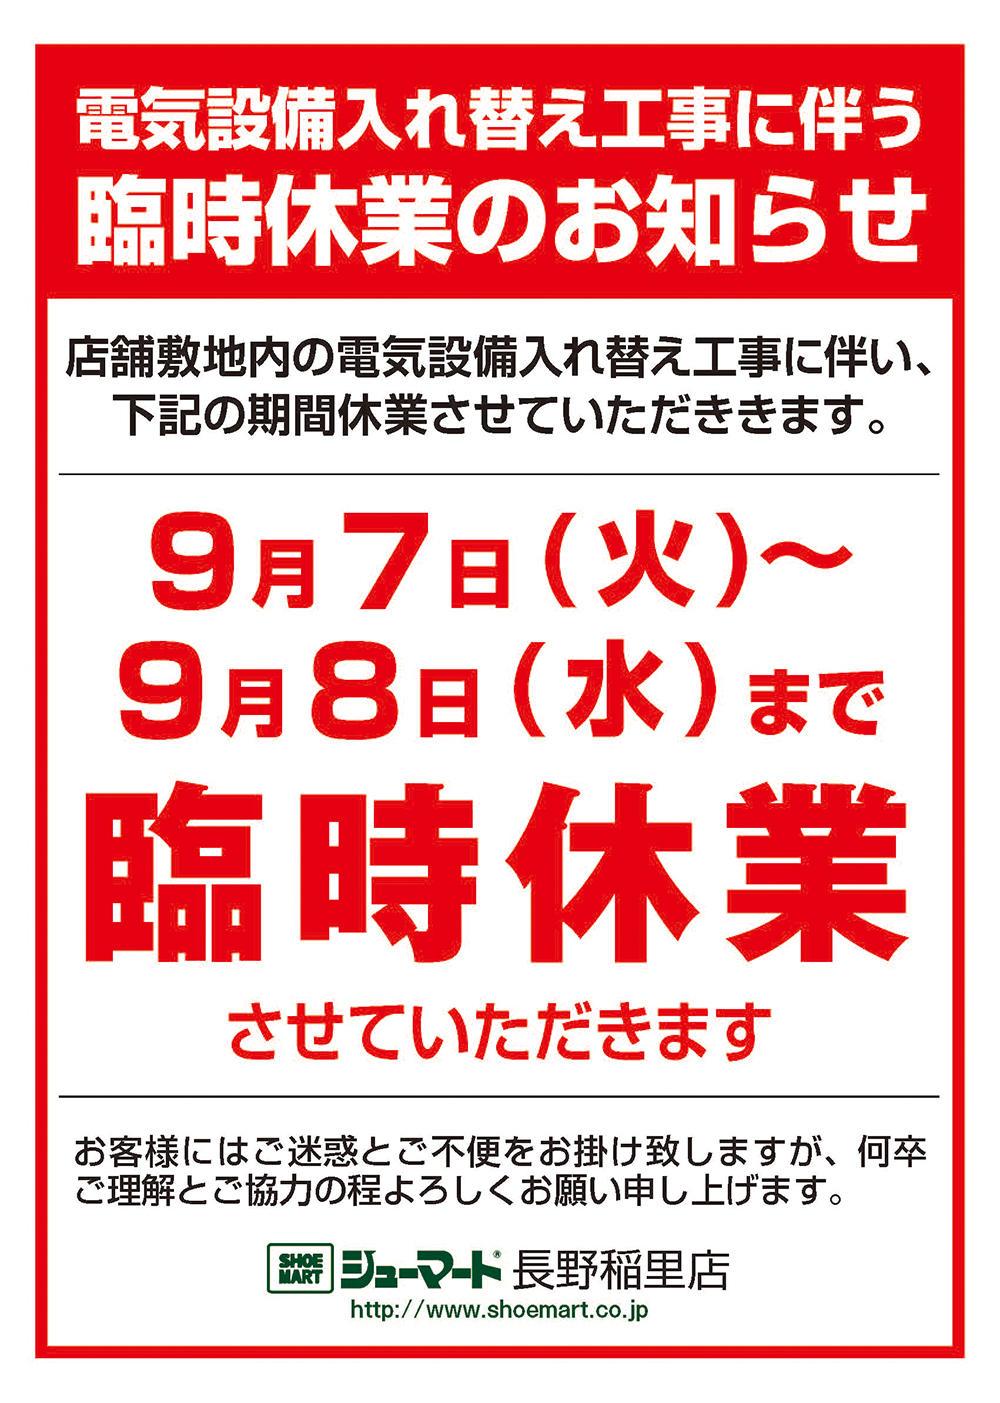 https://www.shoemart.co.jp/images/inasato_090708Closed.jpg